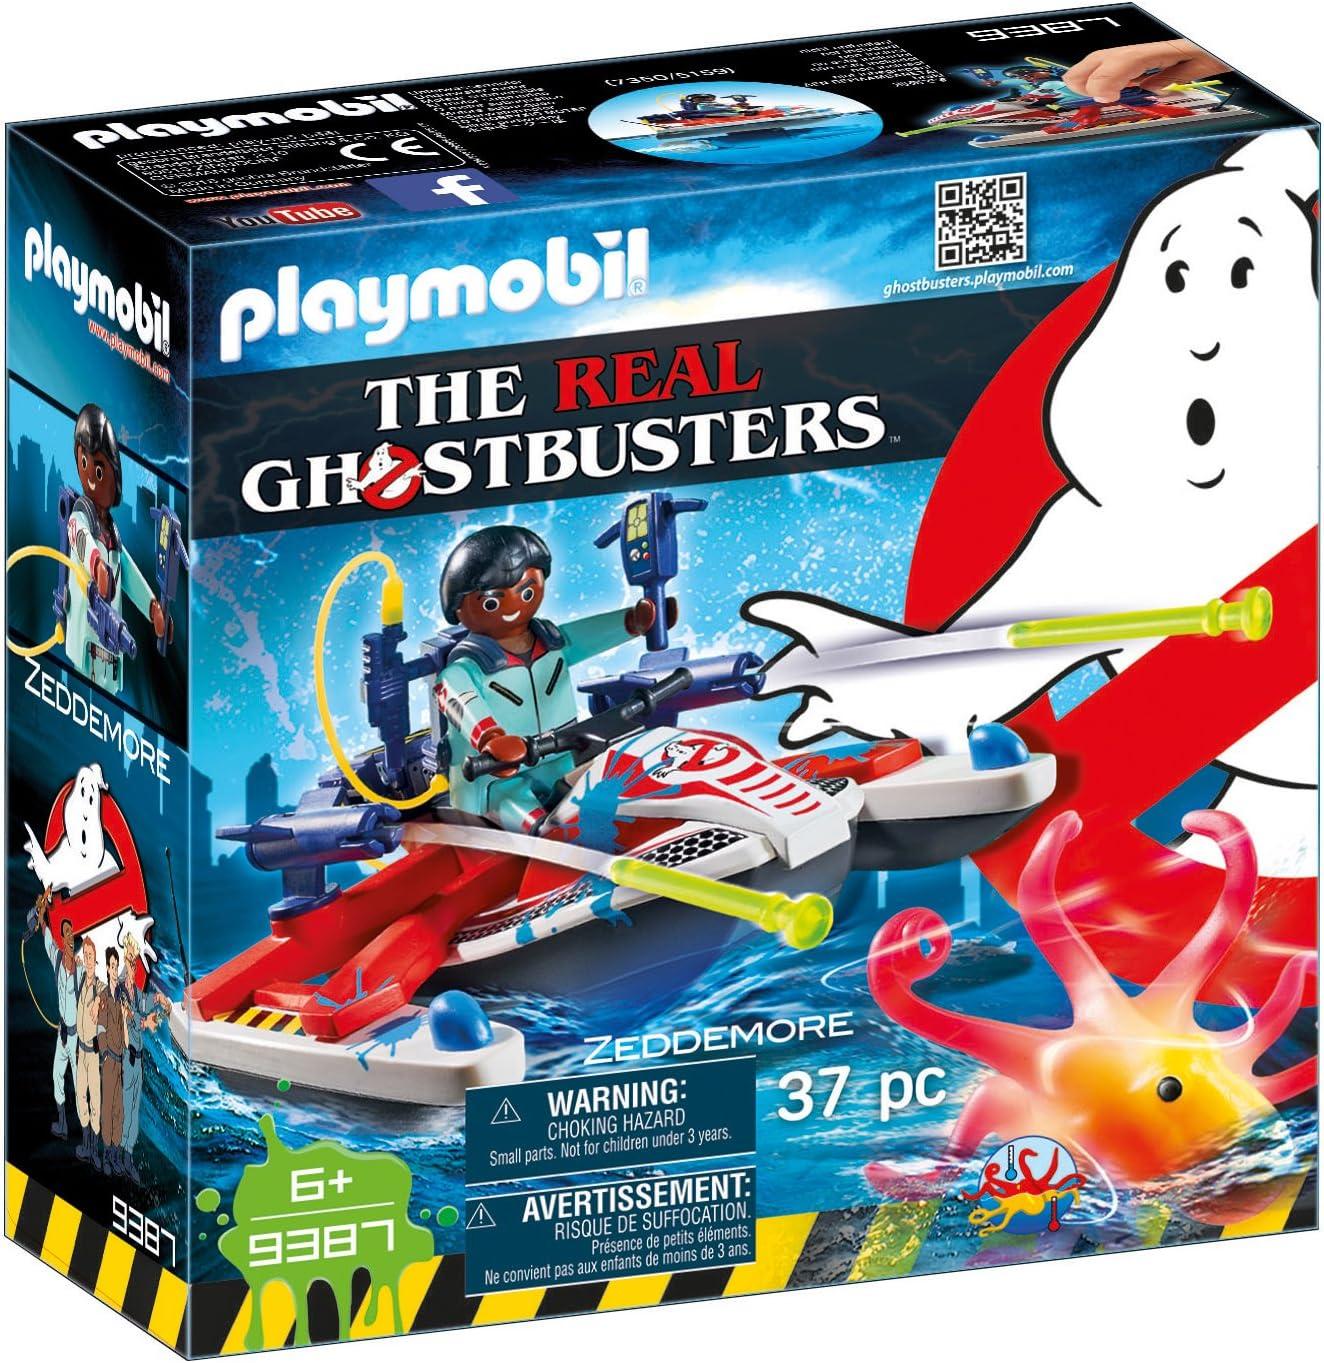 PLAYMOBIL Ghostbusters Zeddemore con Moto de Agua, Flota, a Partir ...